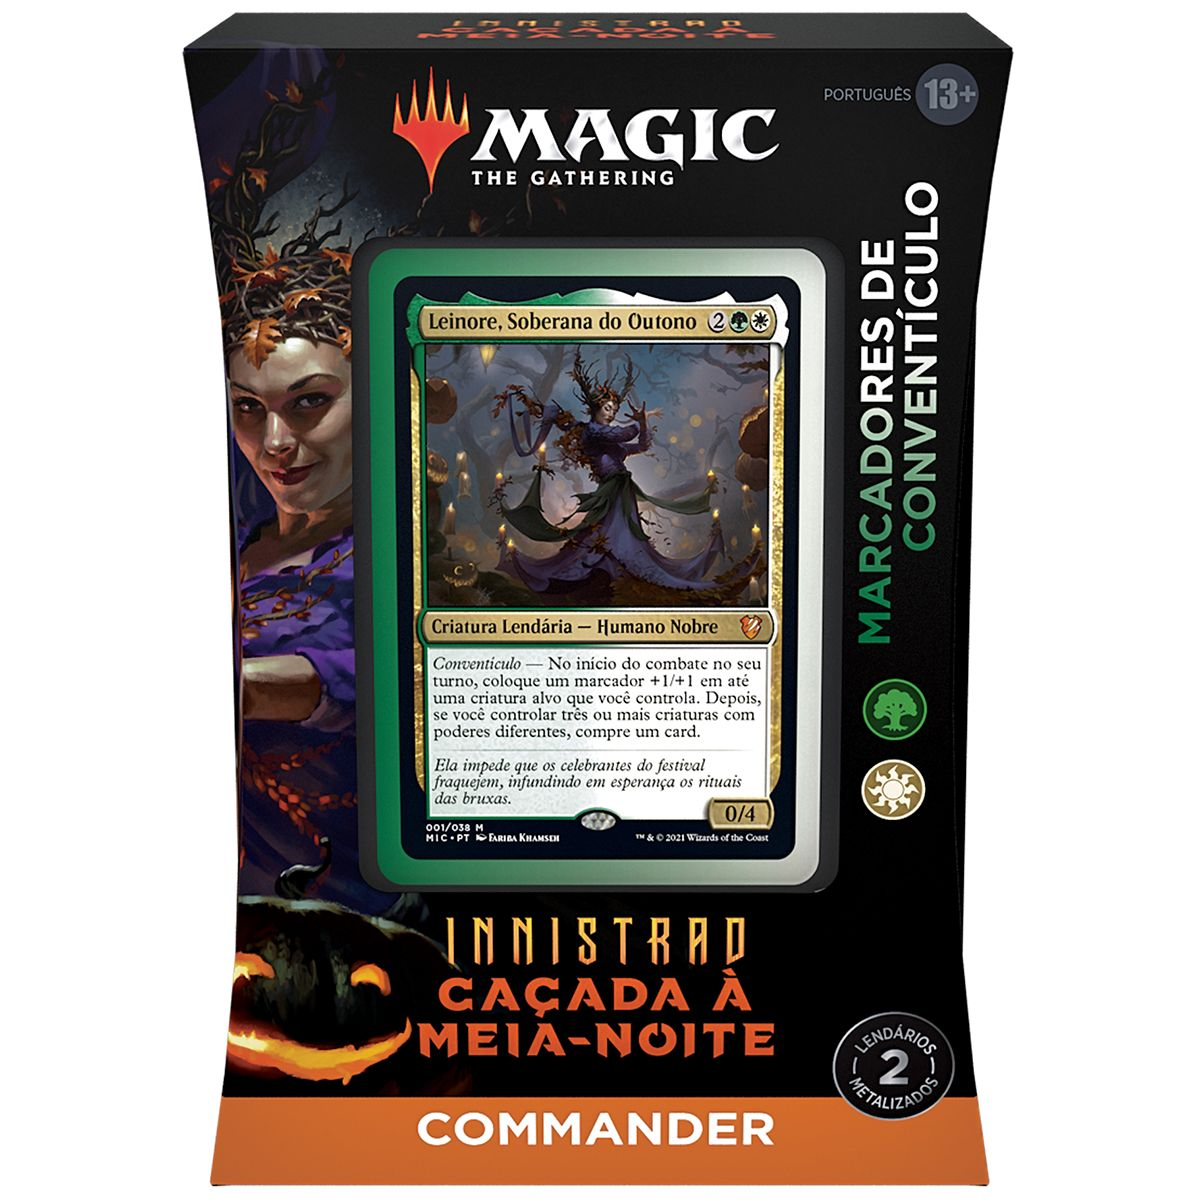 Magic Deck Commander Innistrad Caçada A Meia-Noite Leinore